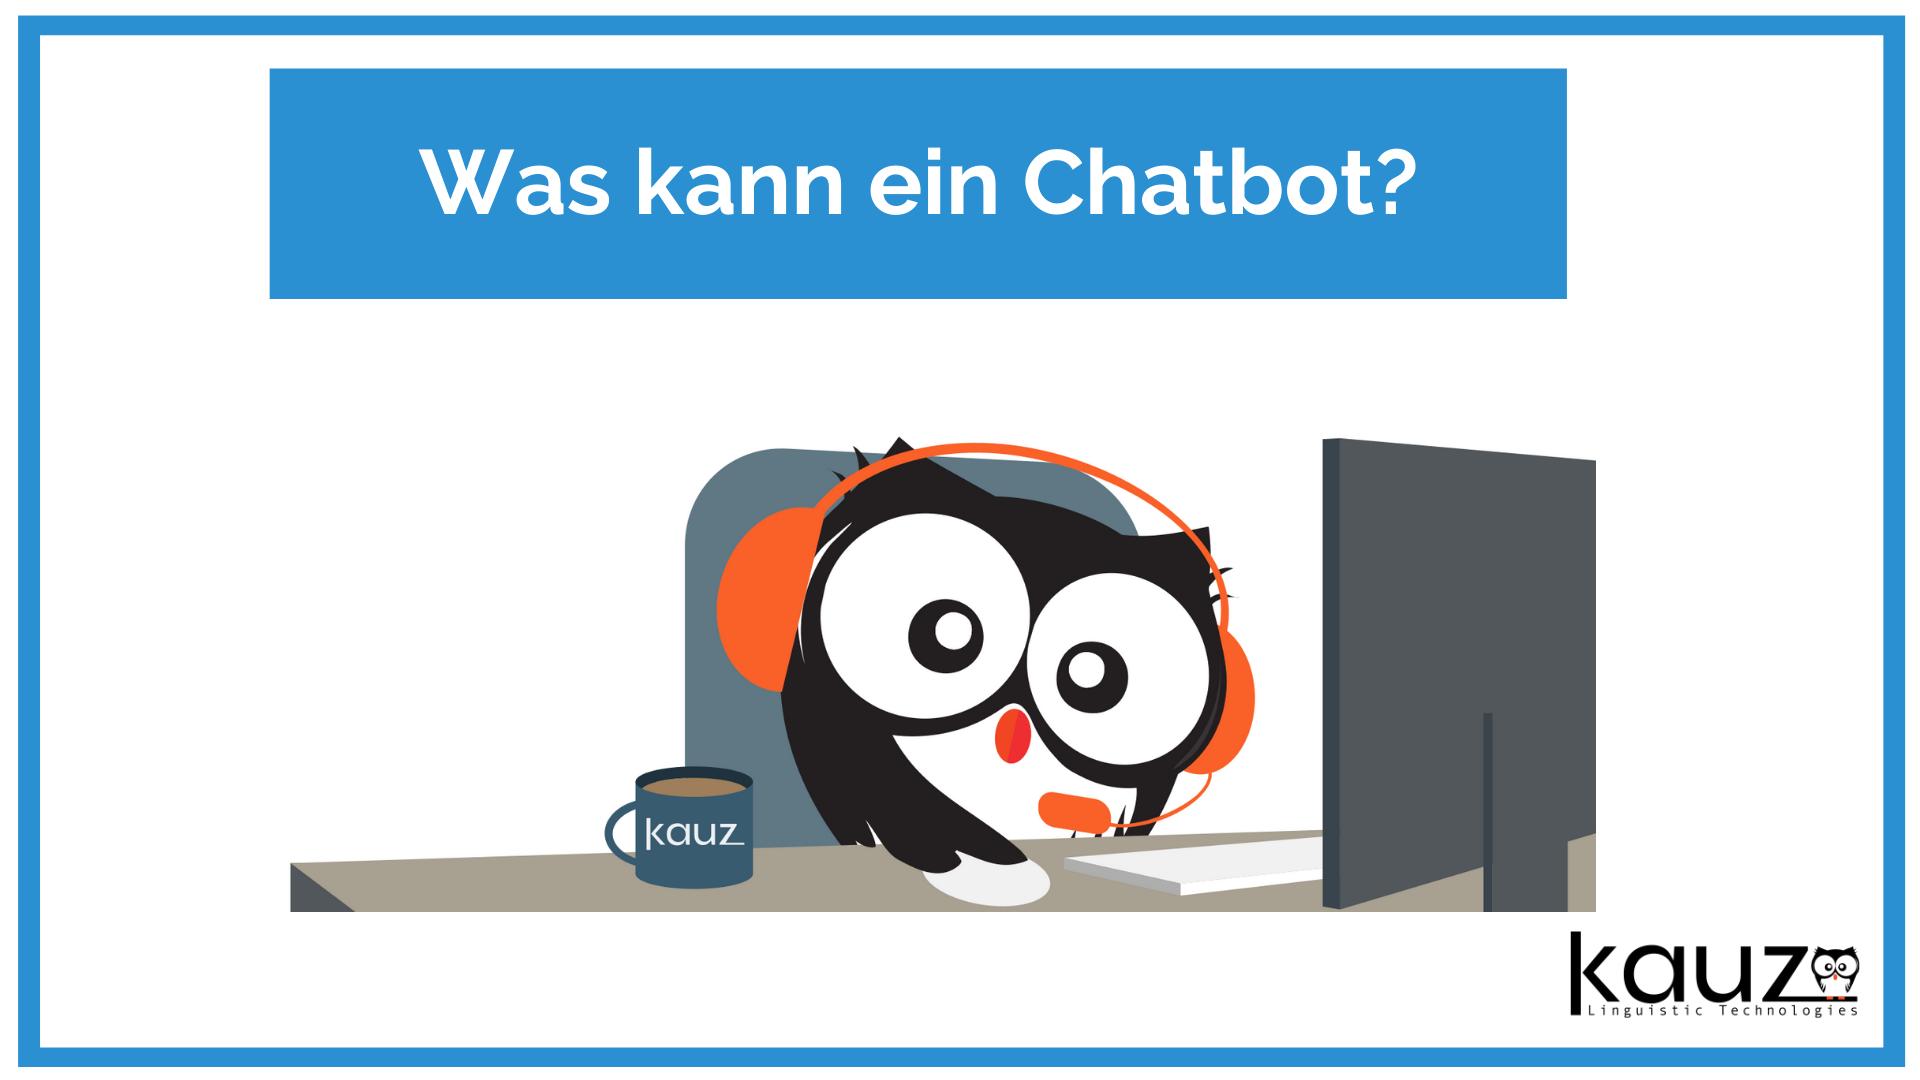 Chatbot Leitfaden, Was Kann Ein Chatbot, Kauz Chatbot